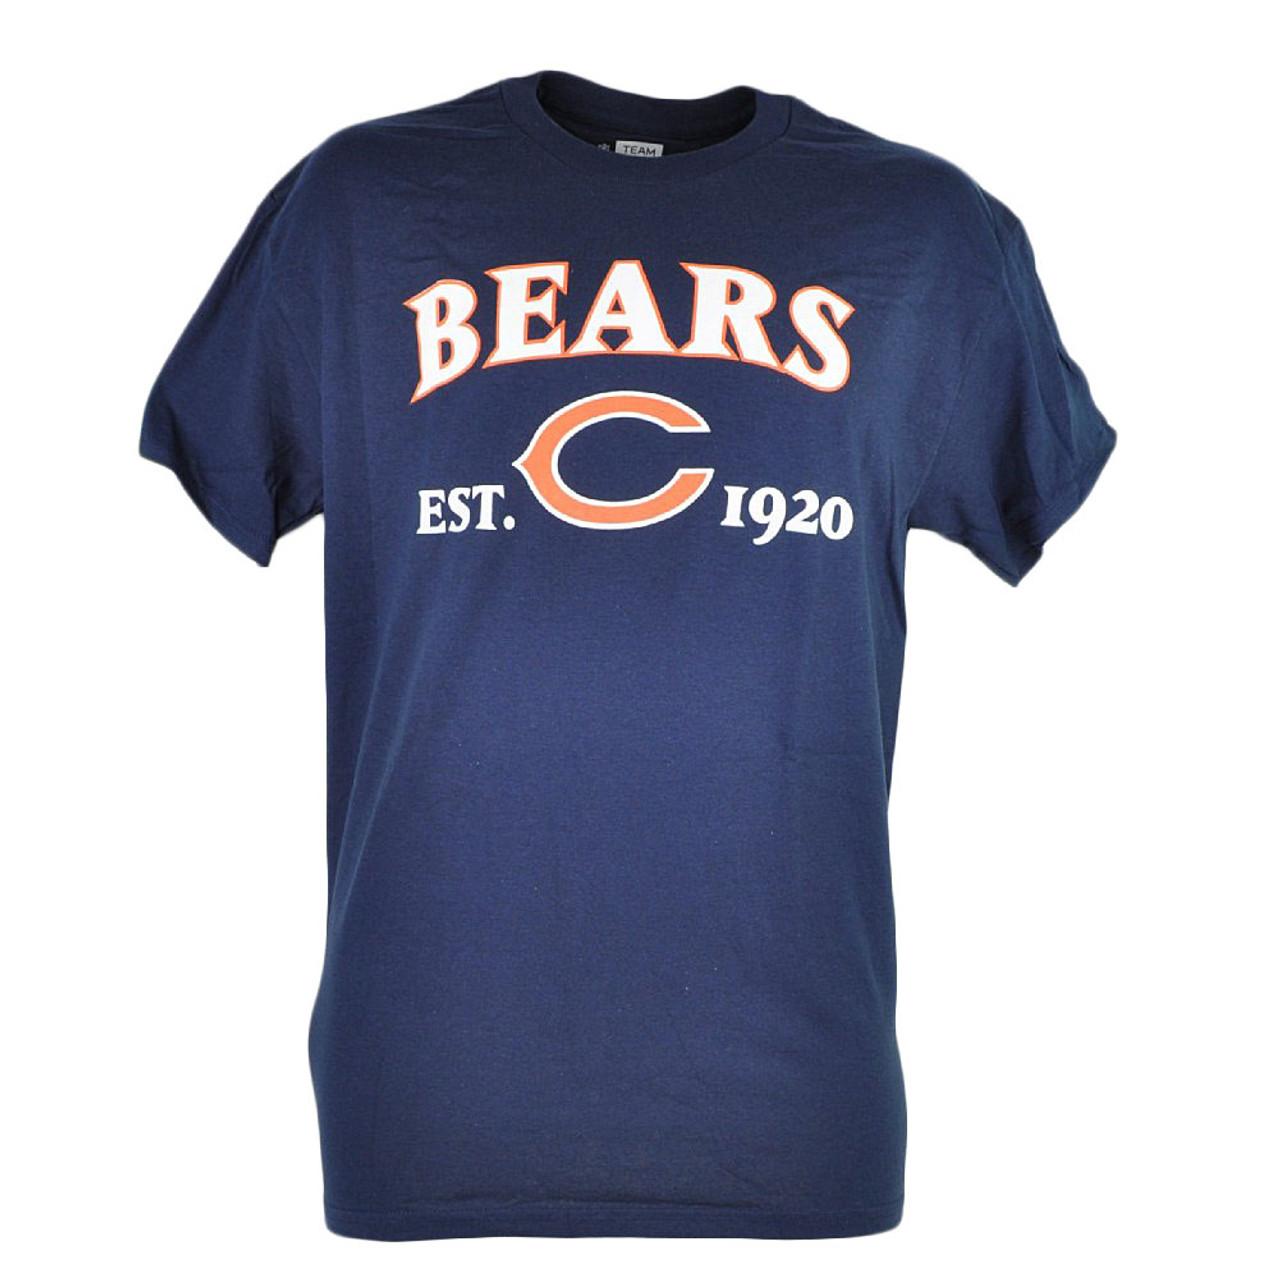 cheap for discount e031b fab6e NFL Chicago Bears Commissioner EST 1920 Football Men Tshirt Tee Navy Blue